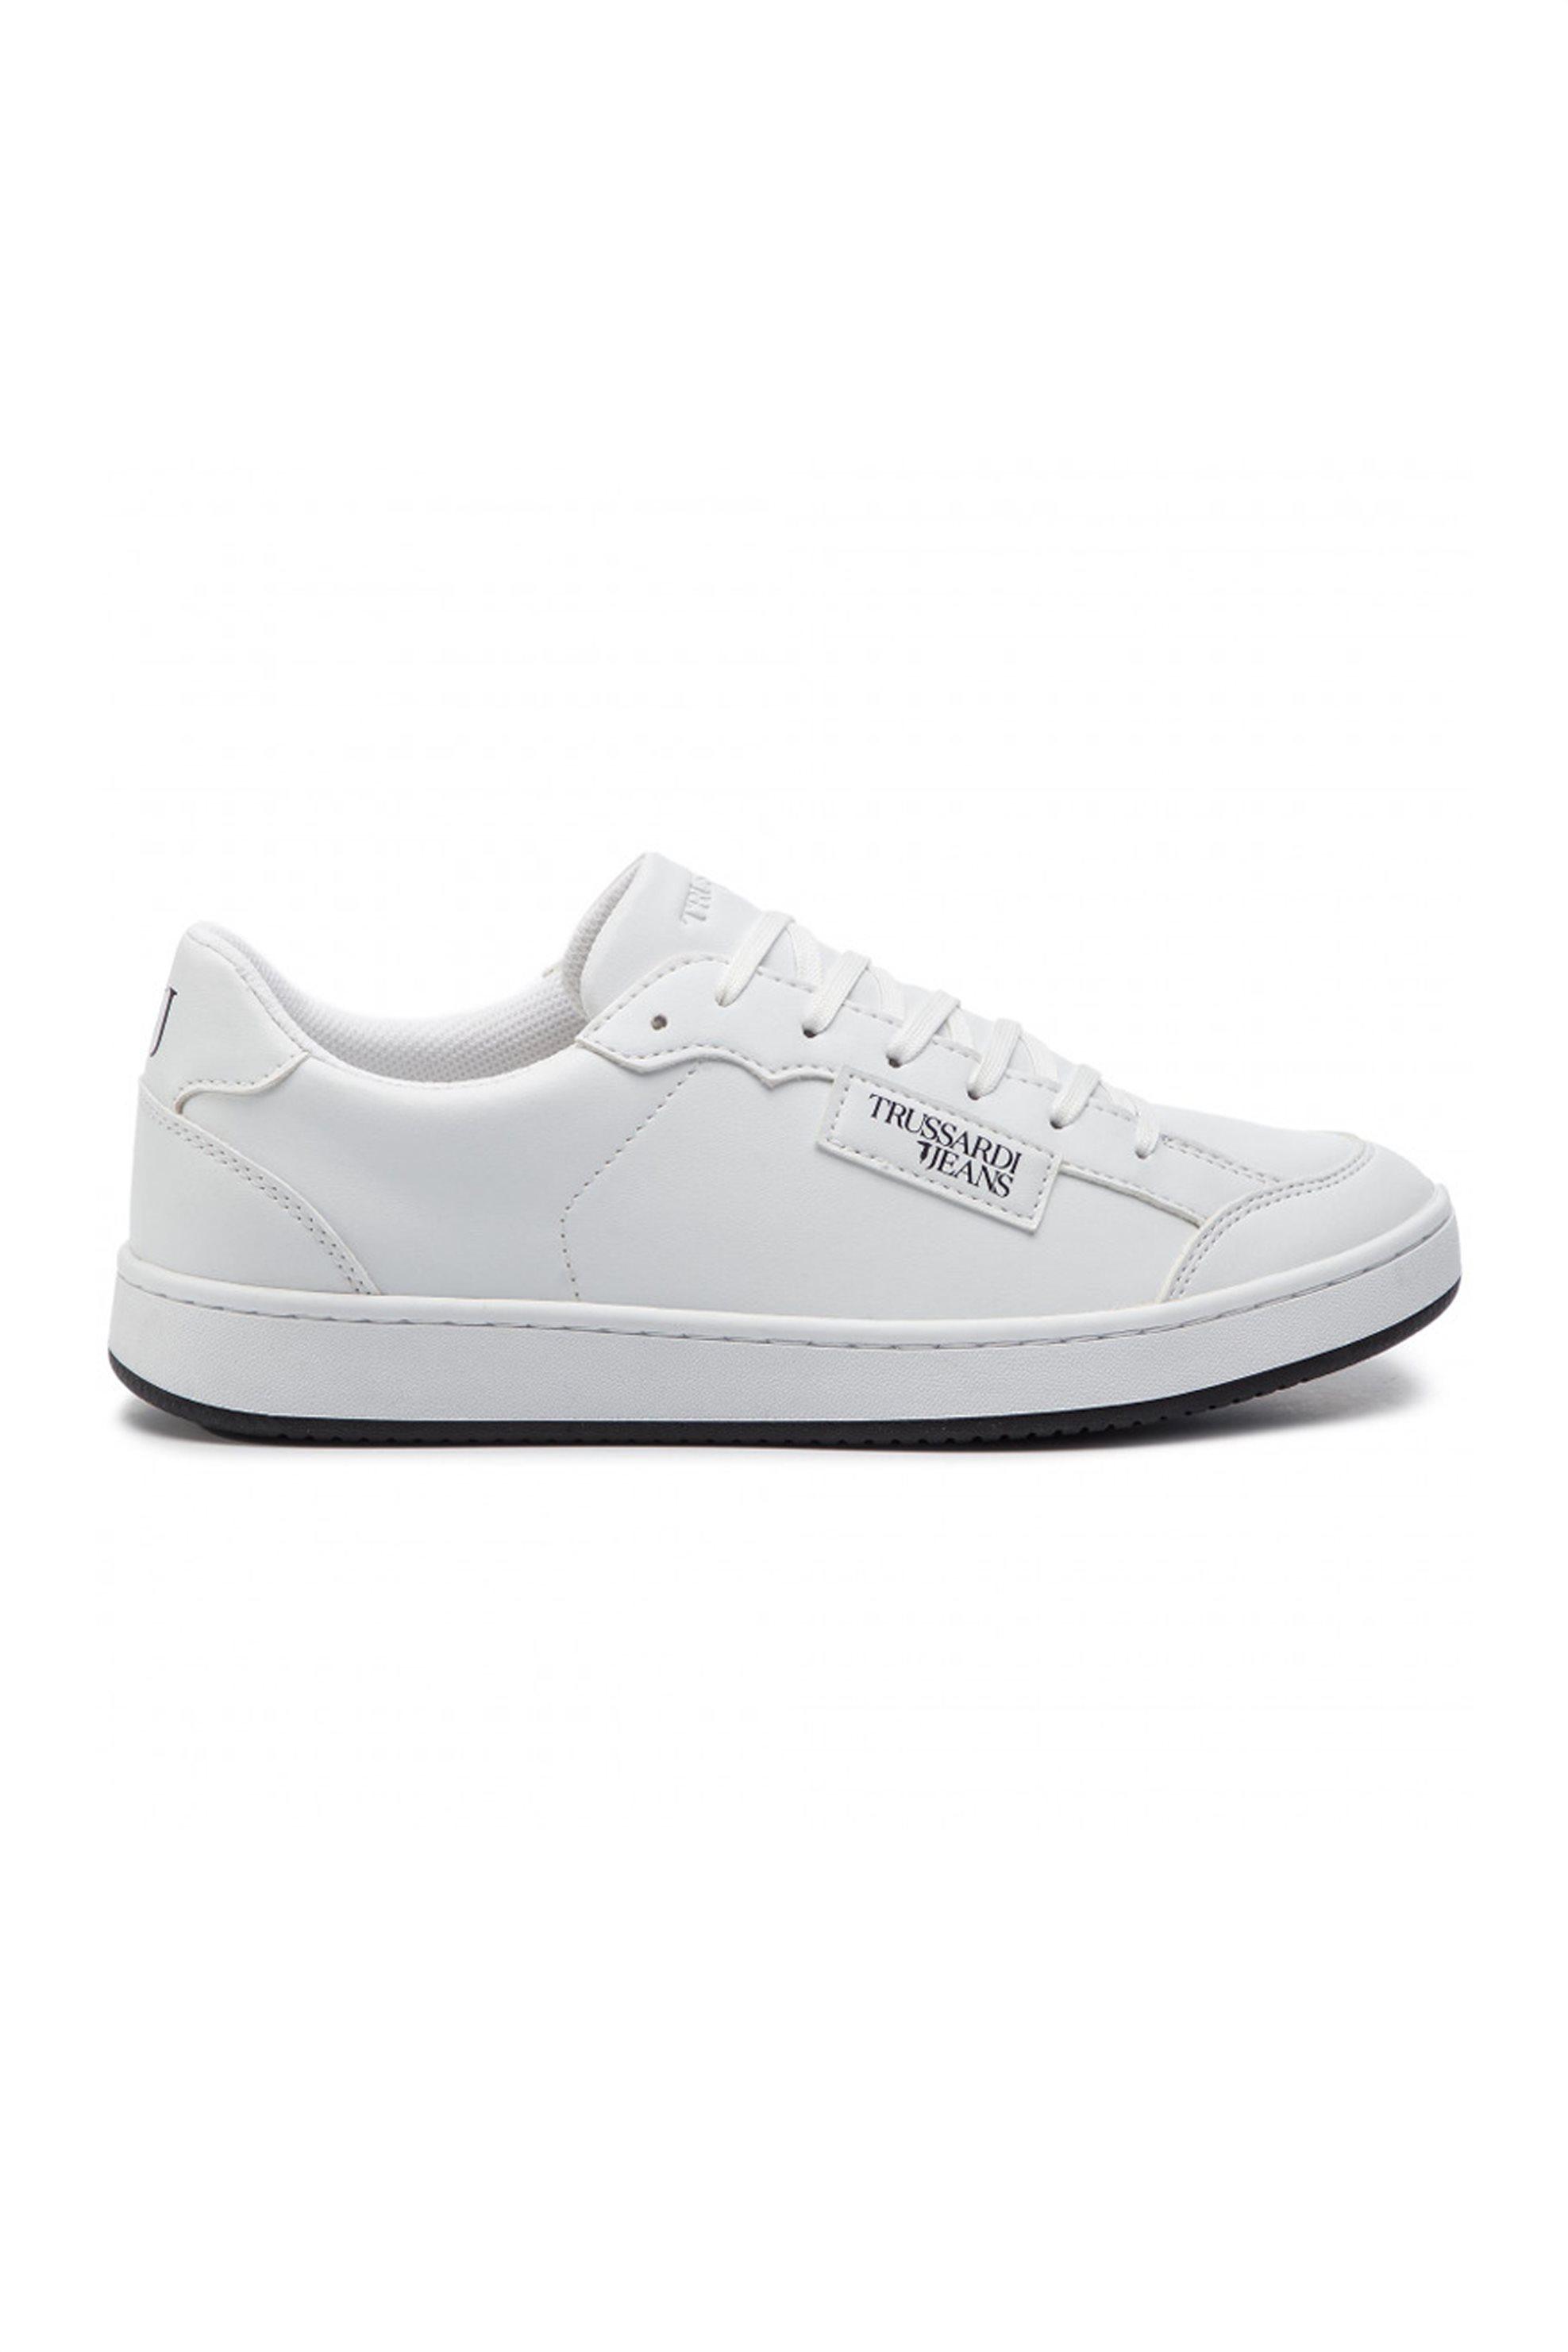 Trussardi ανδρικά sneakers με logo print – 77A00131-9Y099999 – Λευκό